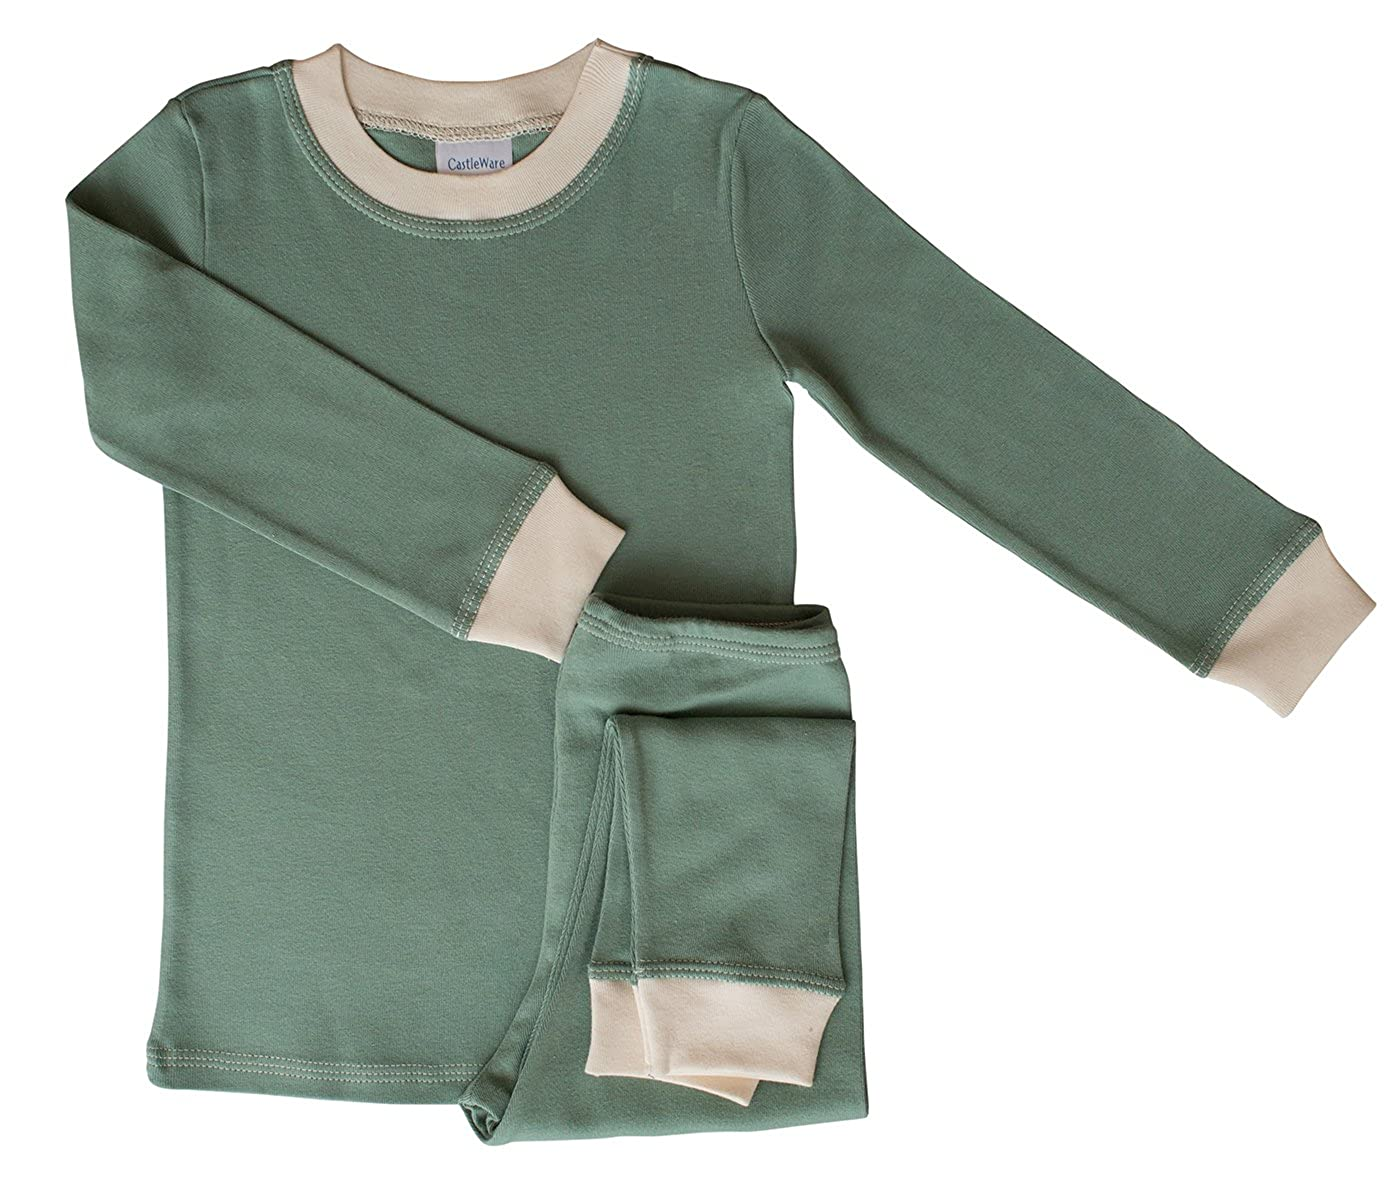 b326f639a Amazon.com  CastleWare Baby Pajama Sets - Organic Cotton Rib Knit ...